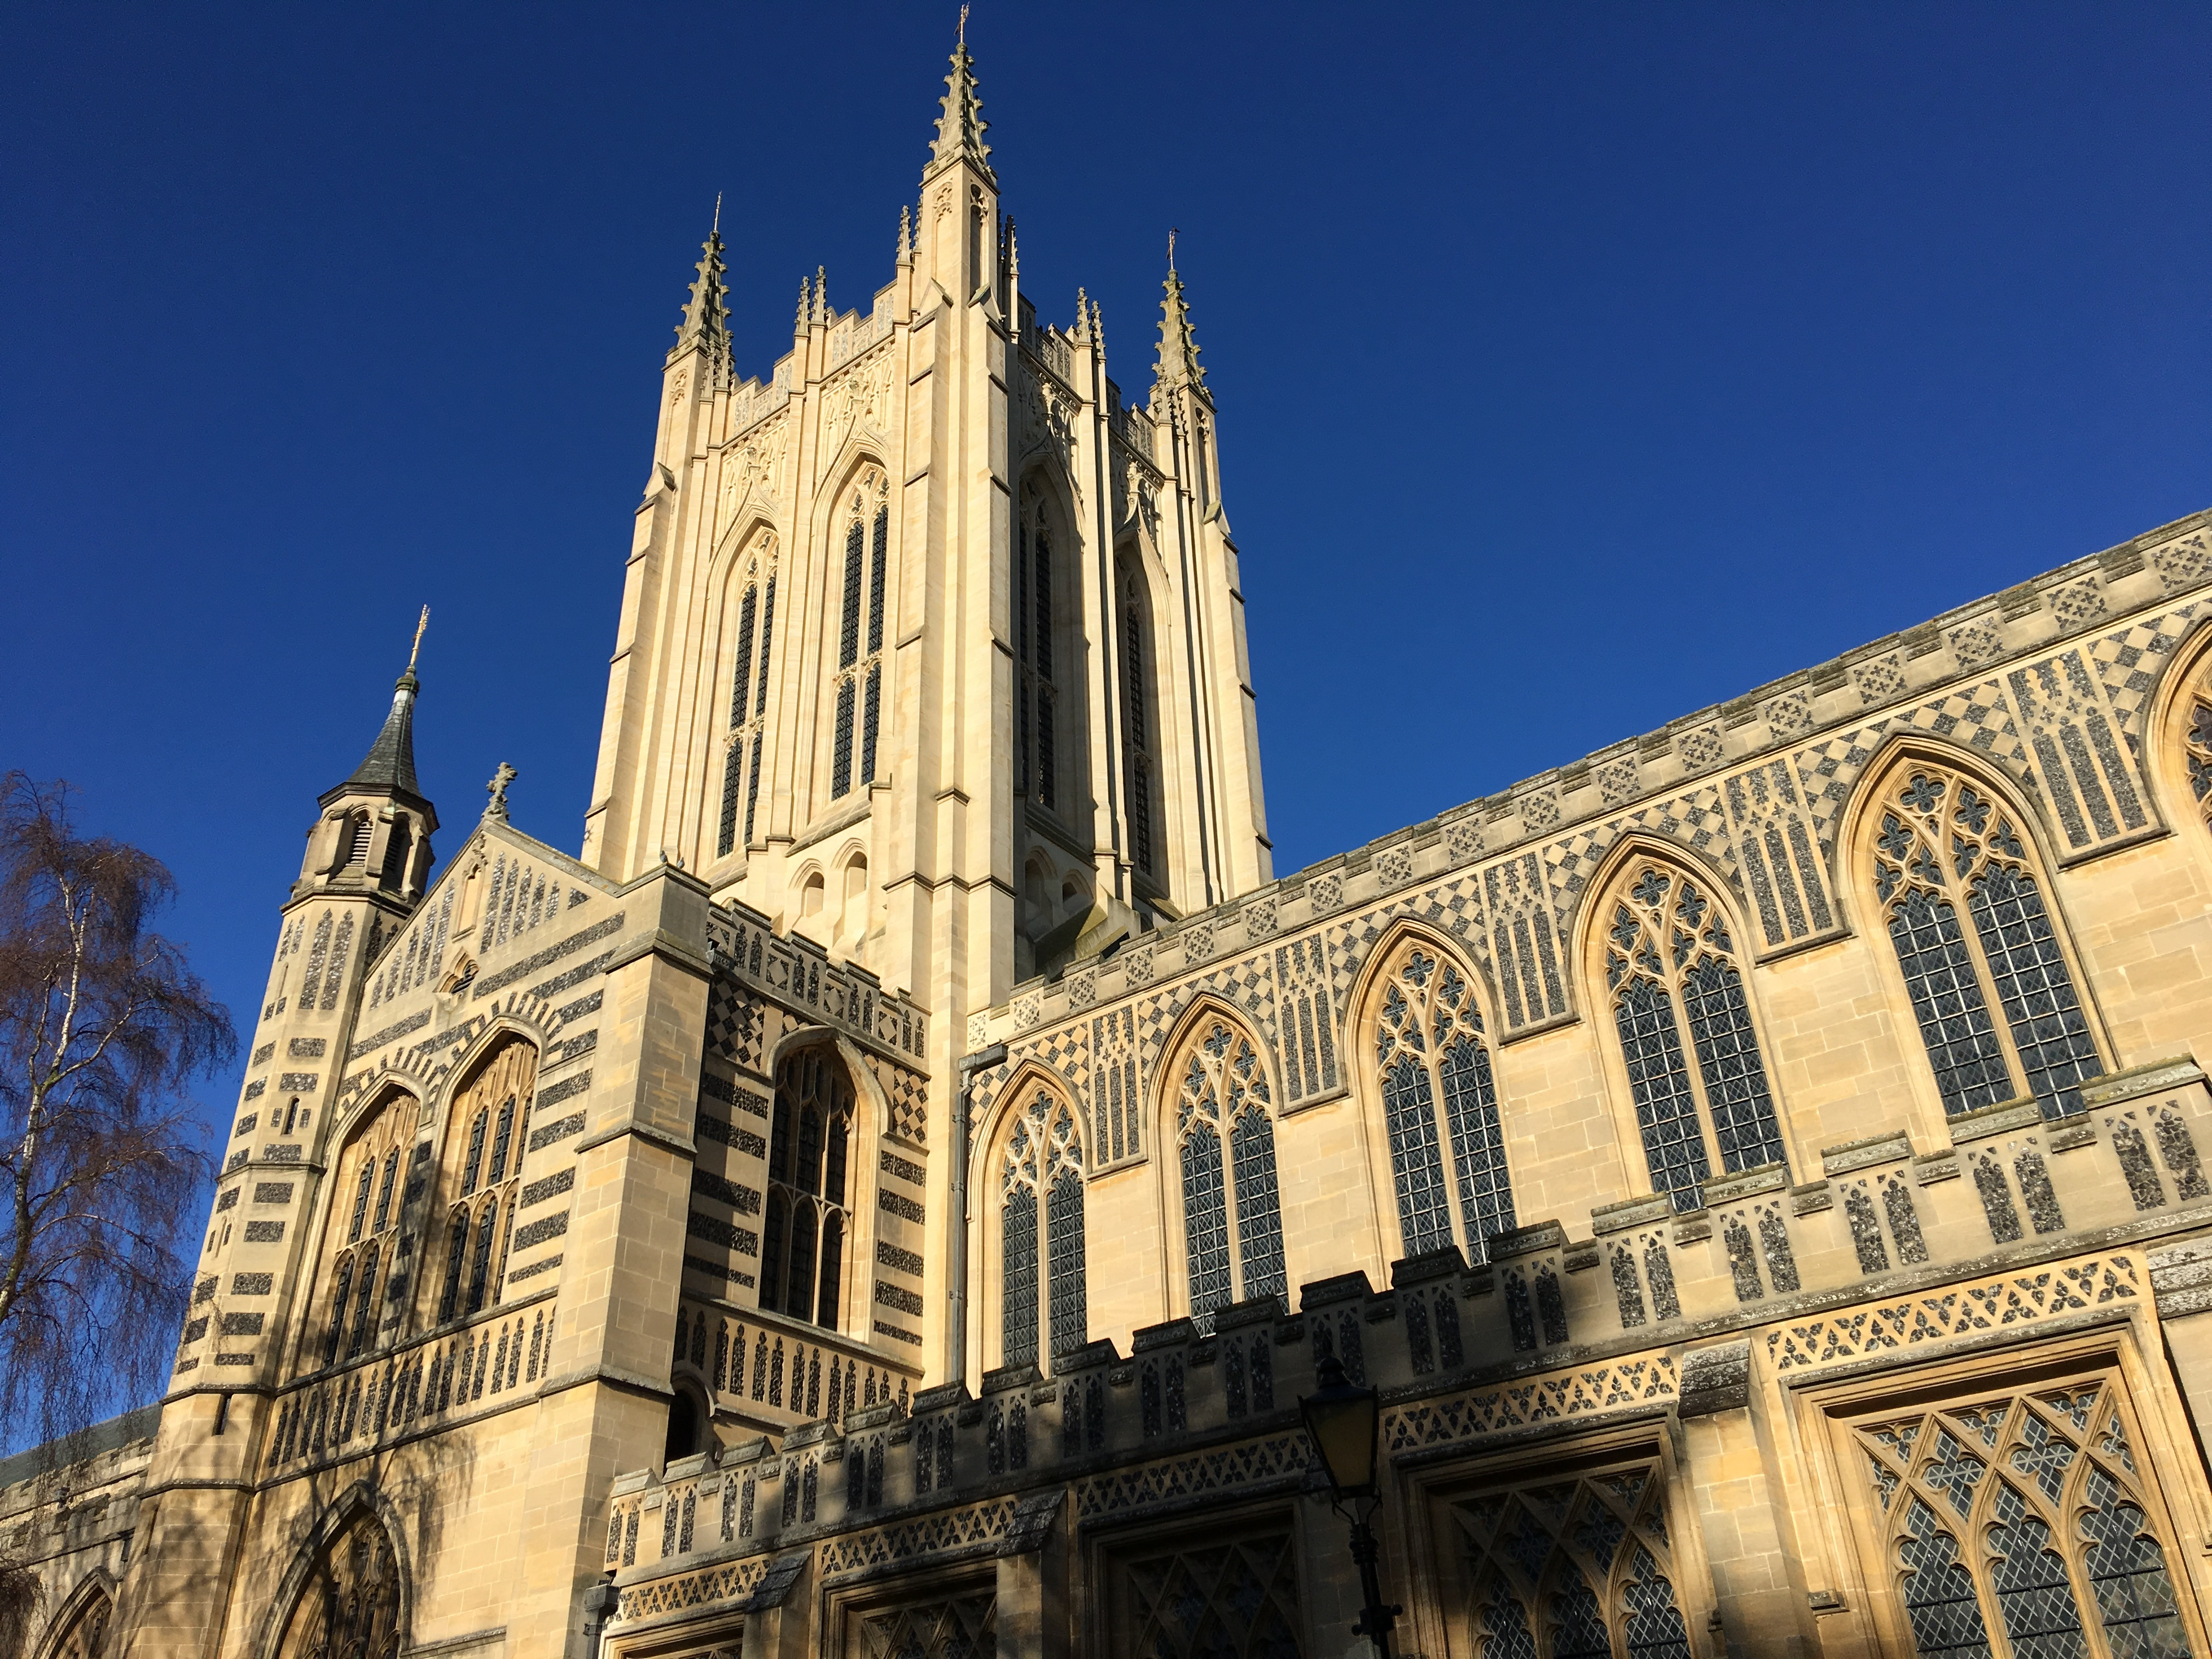 Half Term at St Edmundsbury Cathedral